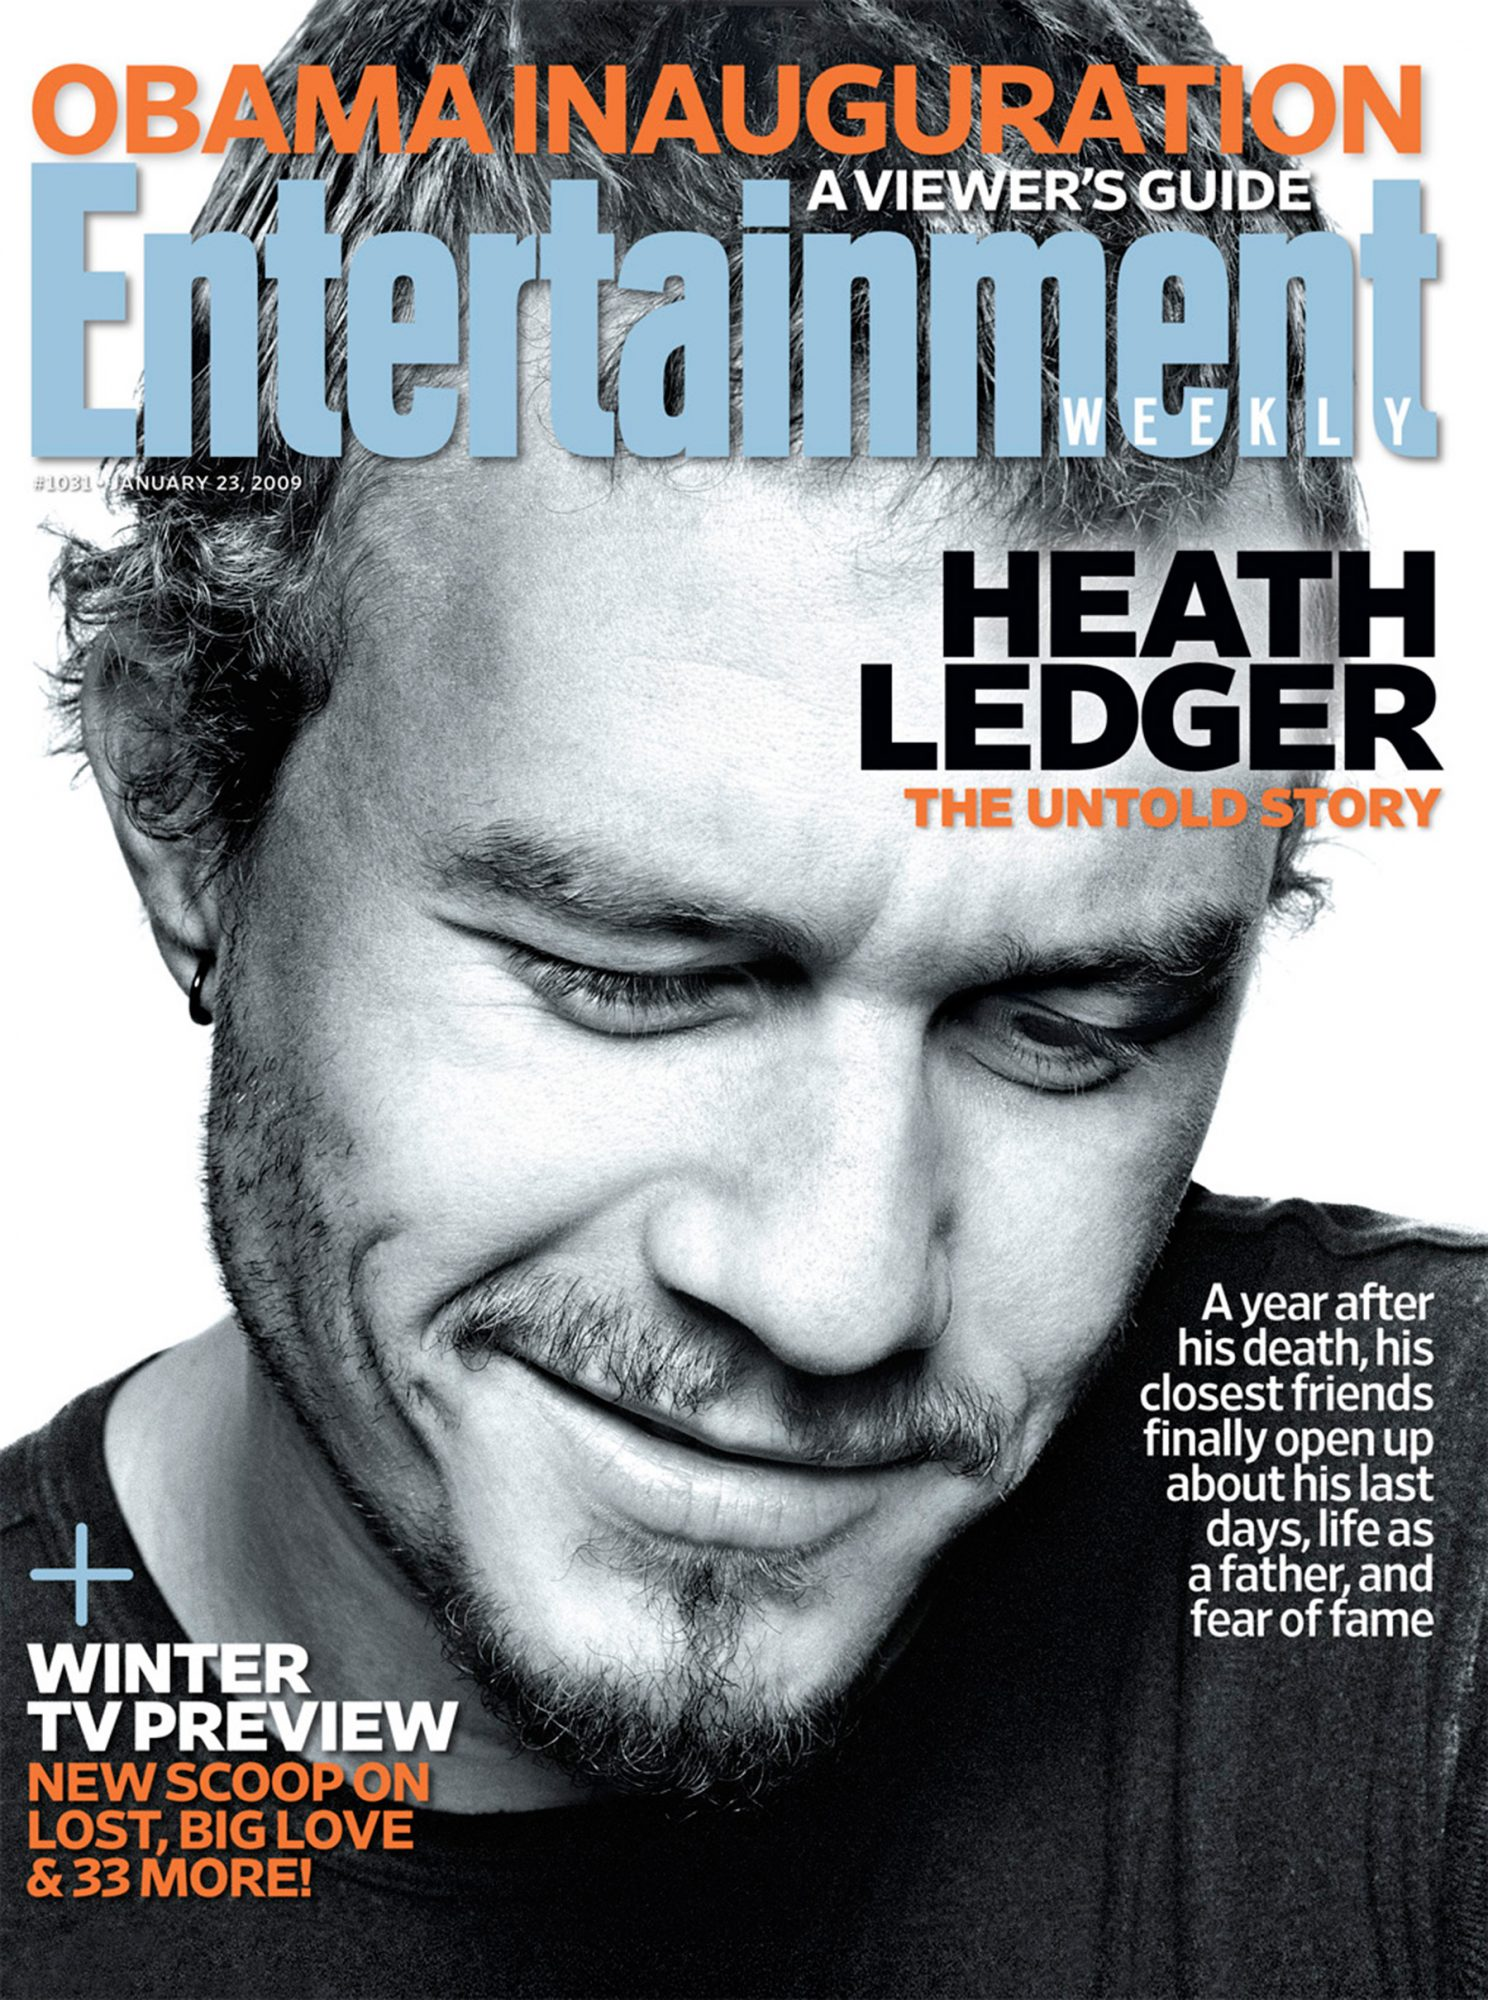 EW CoverIssue 1031January 23, 2009Heath Ledger